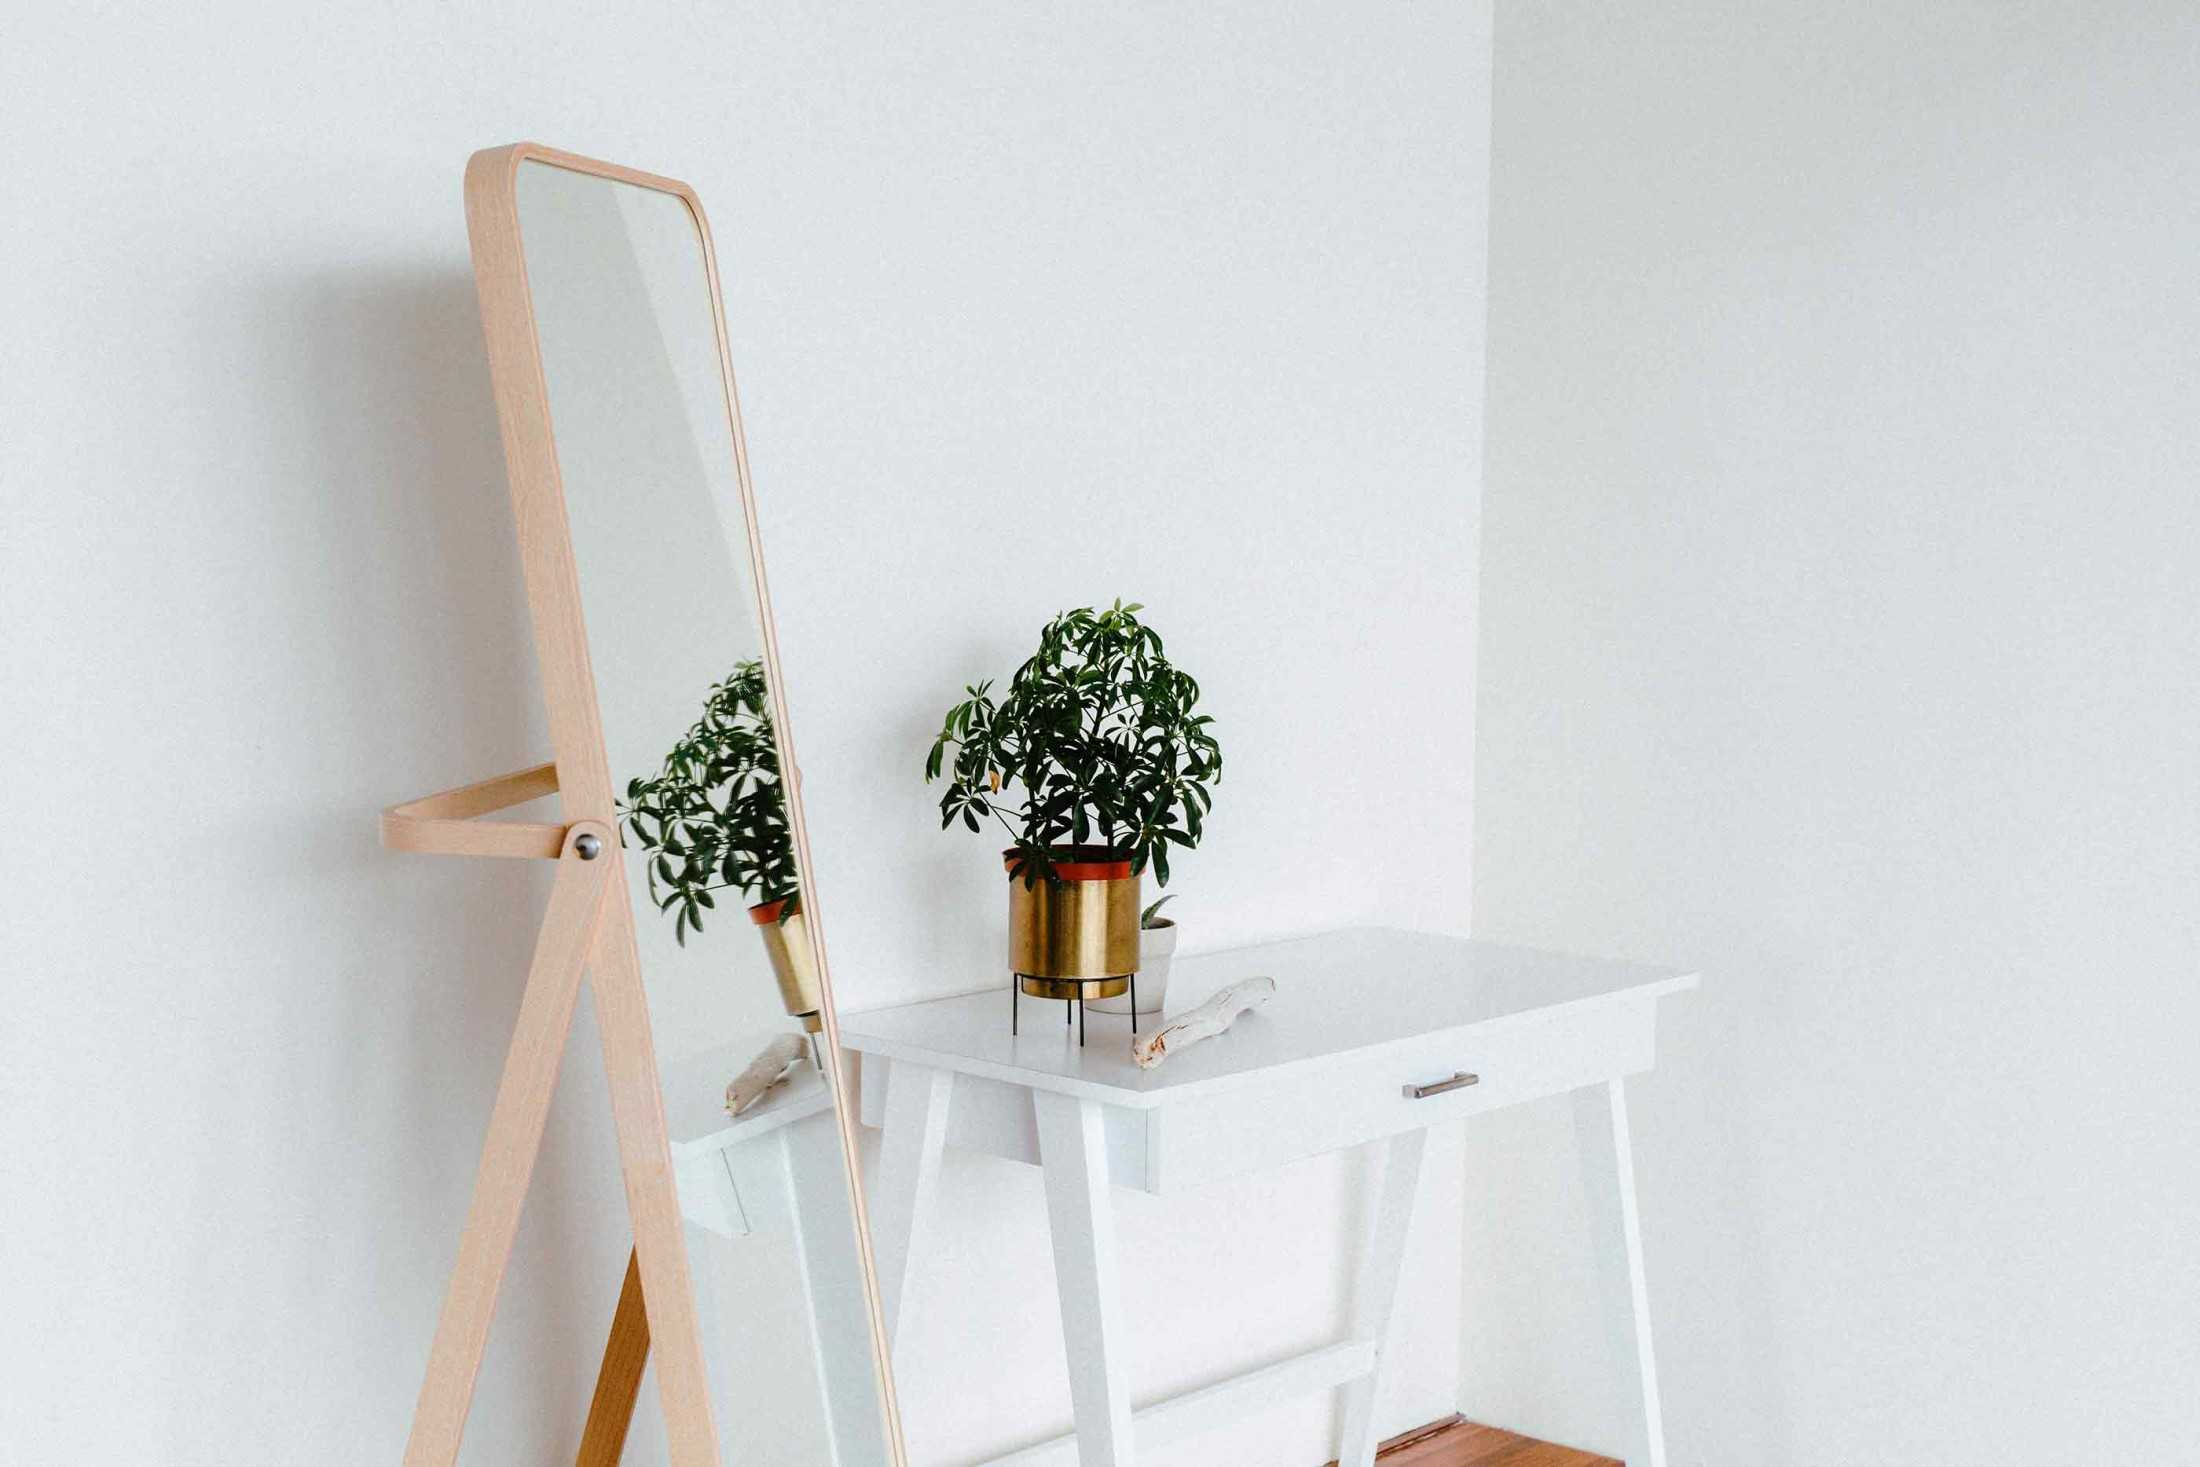 Cermin standing minimalis yang cantik, foto oleh Liana Mikah, via unsplash.com